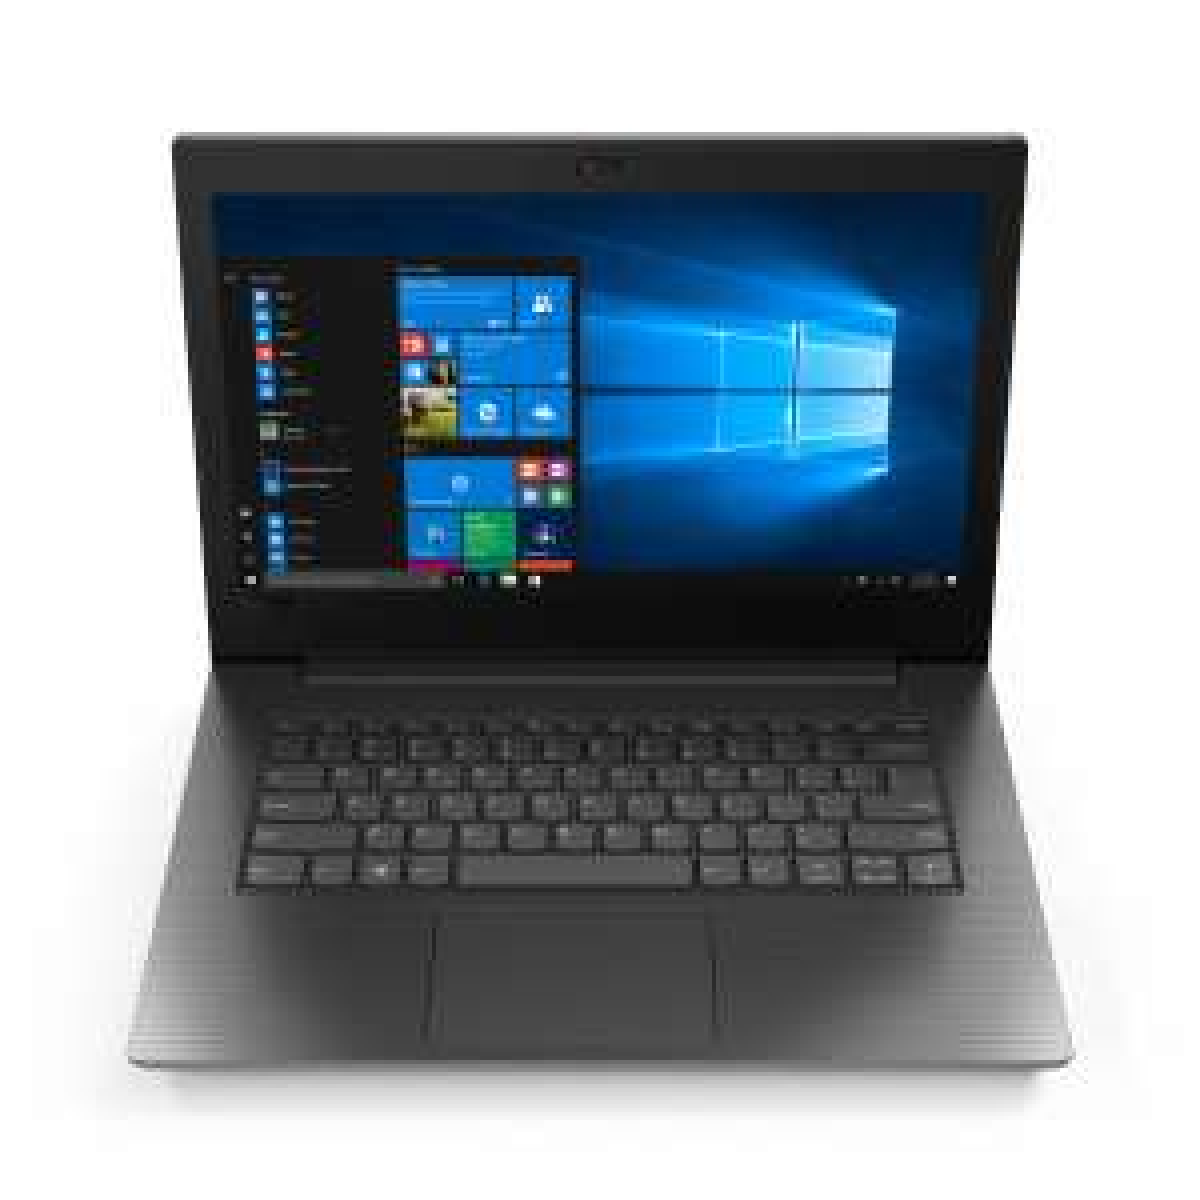 "Lenovo V130-14IKB 14"" Full-HD, Pentium Gold 4415U, 4GB RAM, 128GB M.2 PCIe SSD, 2xUSB 3.0, WLAN ac, FreeDOS, Gewicht 1.55kg"